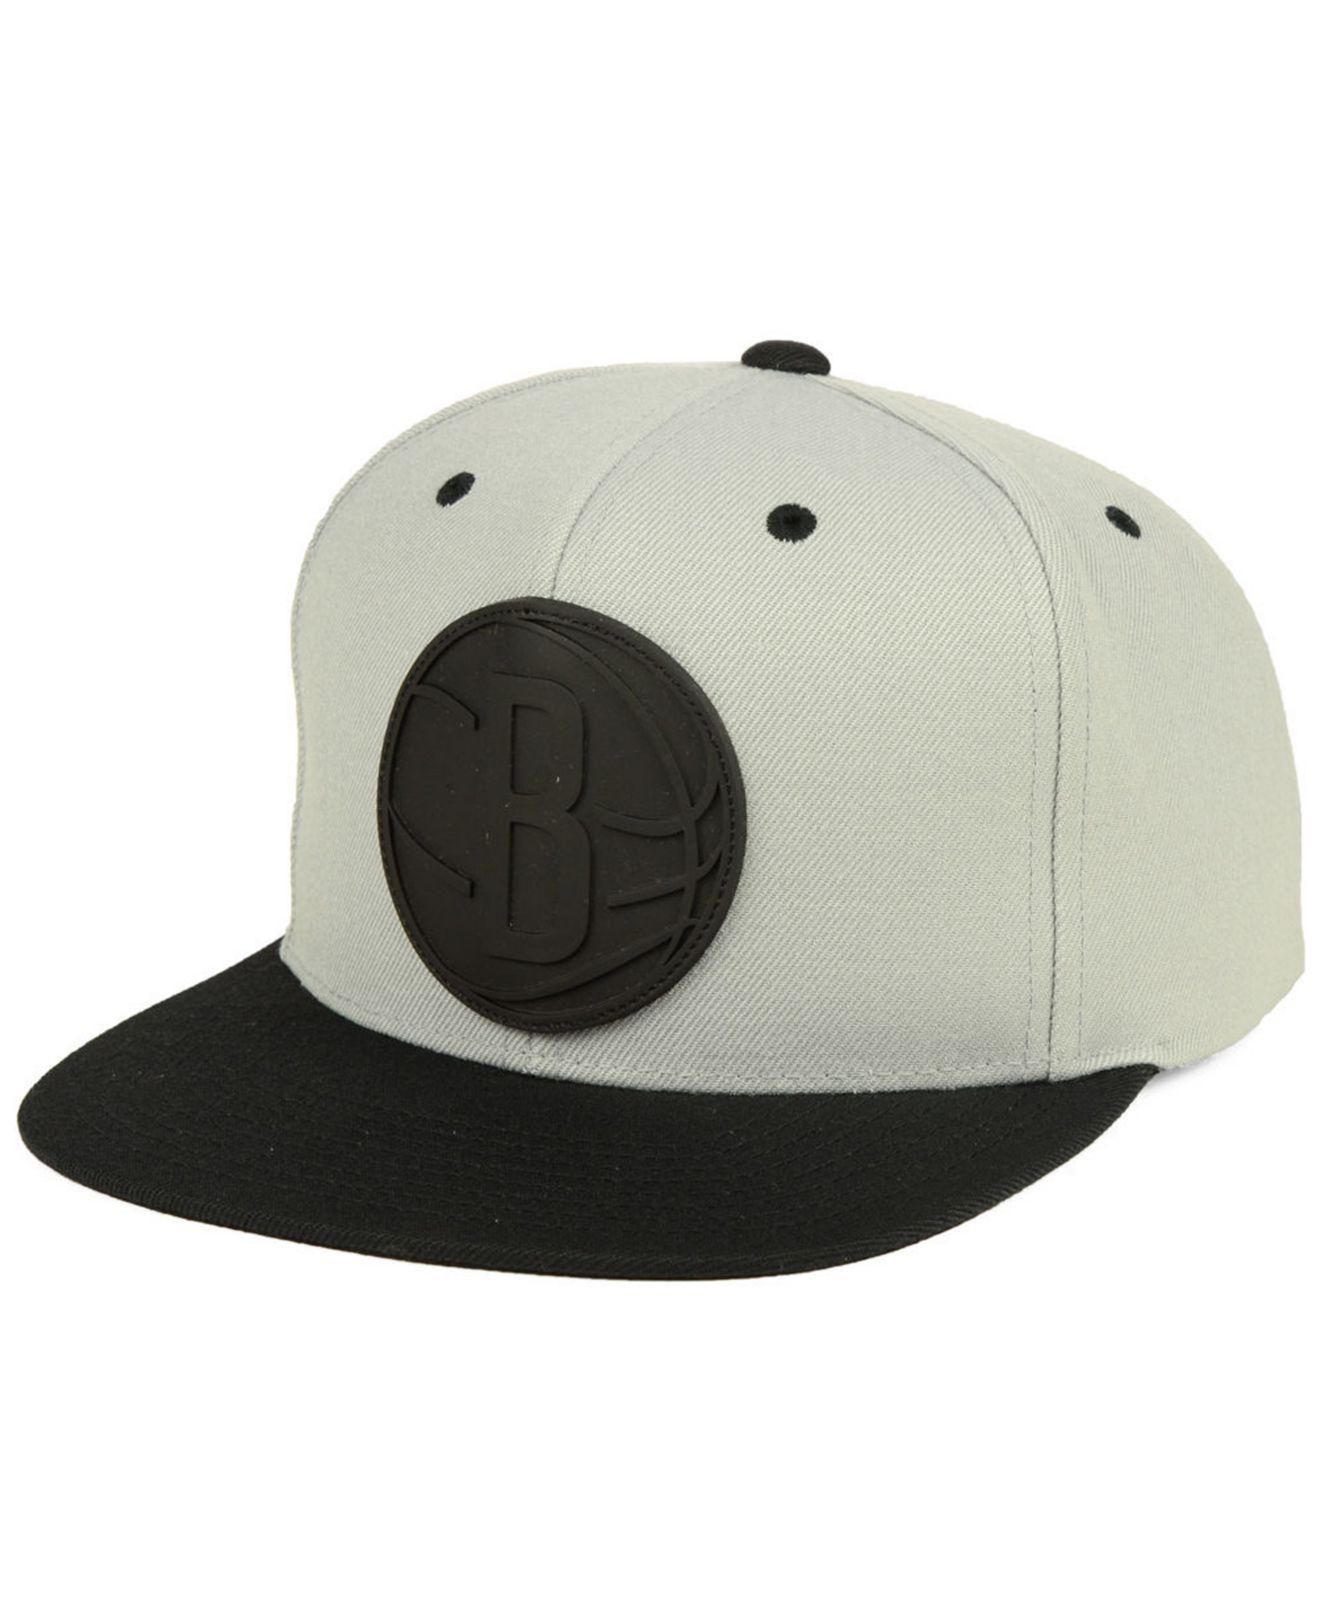 8c1dce2b3d7 Lyst - Mitchell   Ness Brooklyn Nets Rubber Weld Snapback Cap for Men